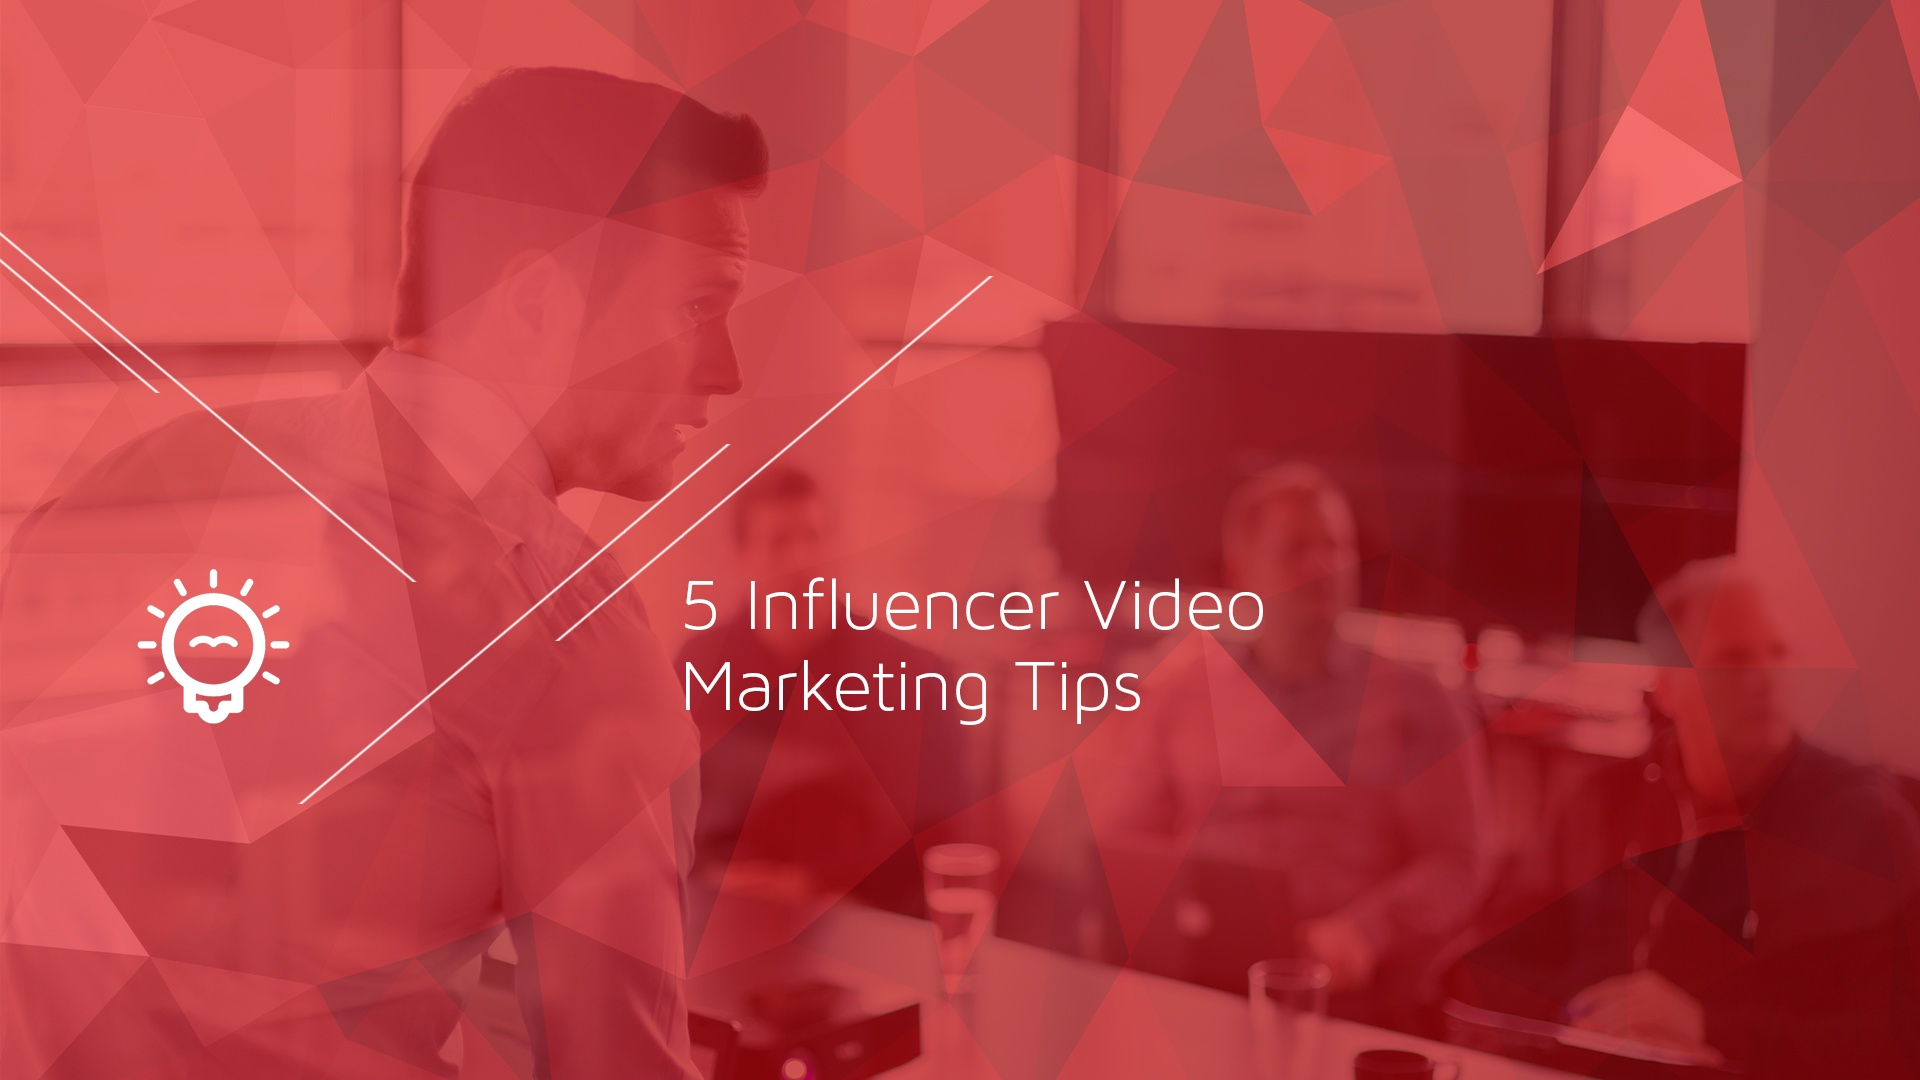 5 Influencer Video Marketing Tips.jpg